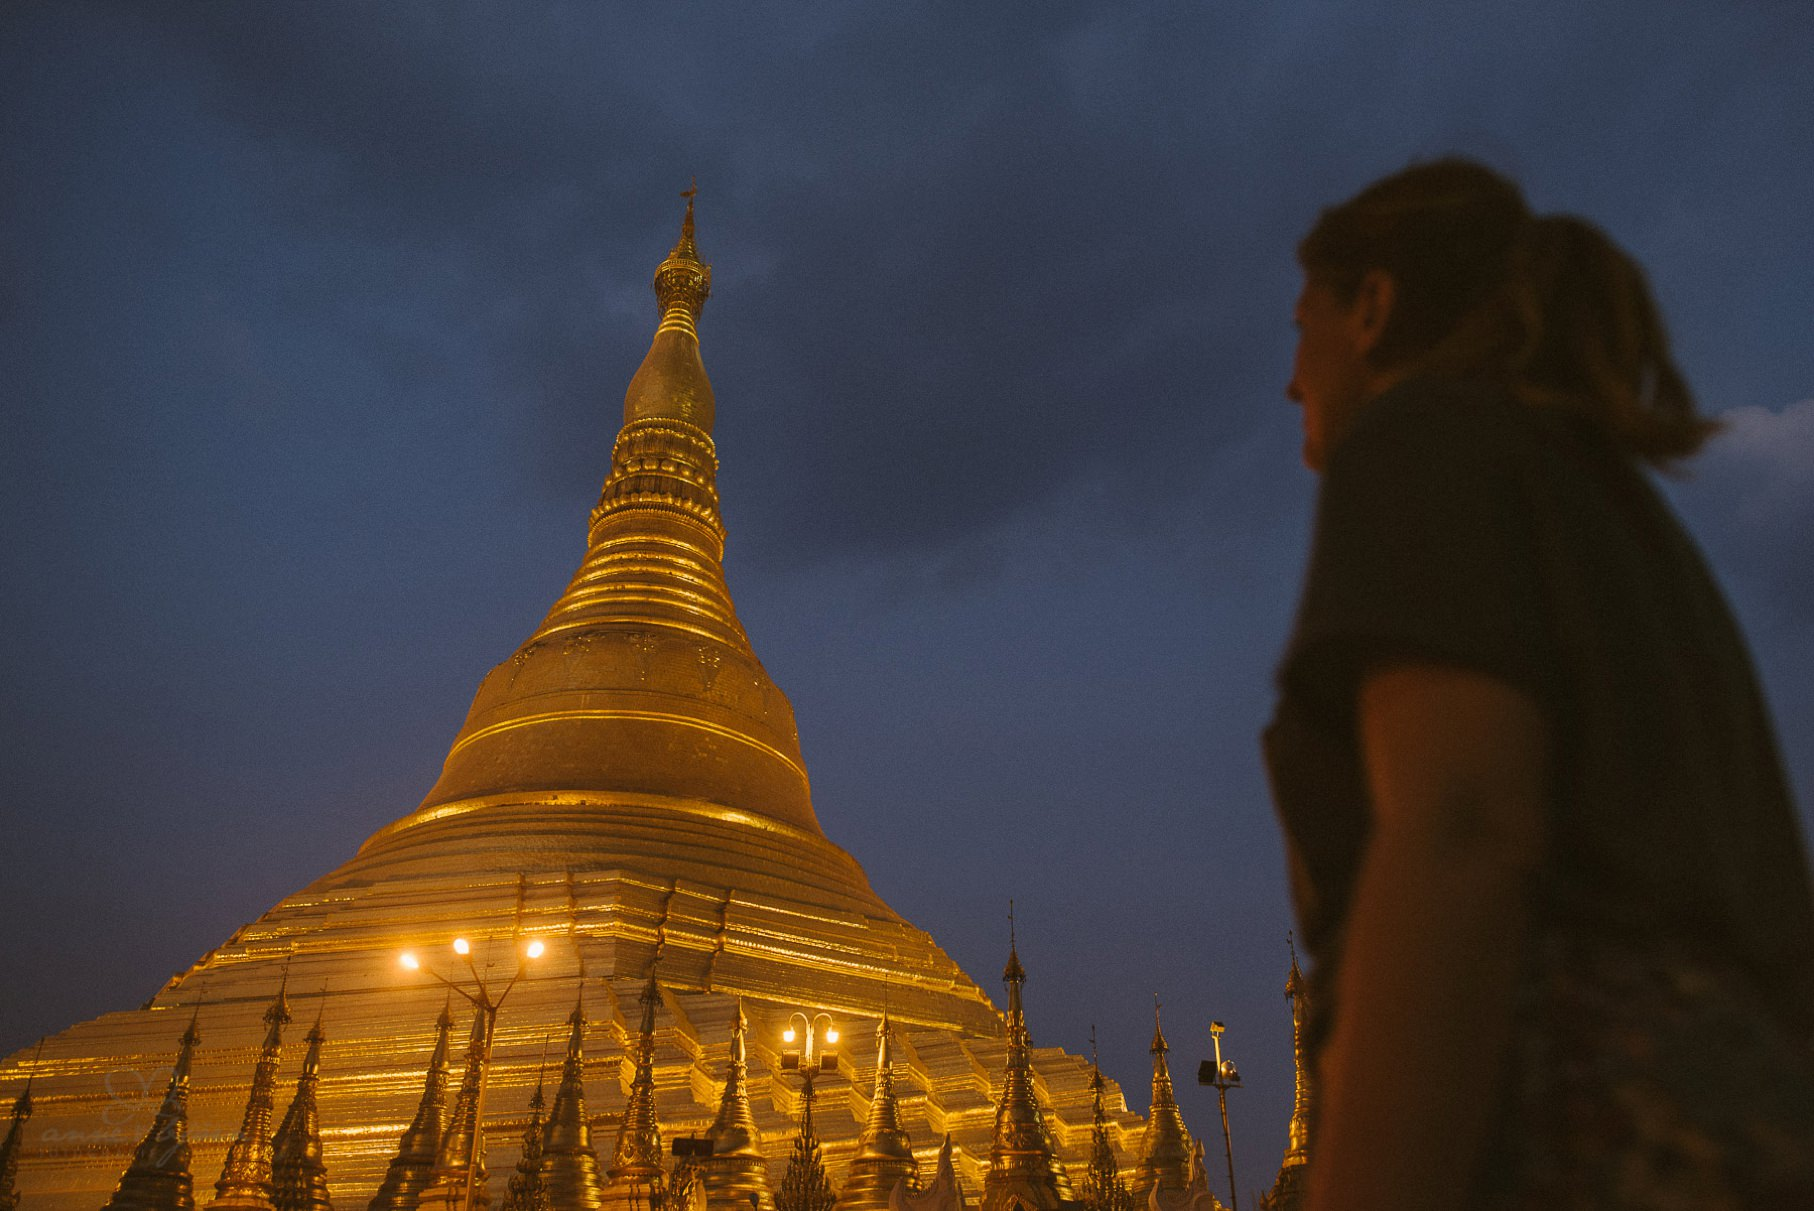 0026 yangon mandalay d76 4628 - Großstädte Myanmars - Yangon & Mandalay